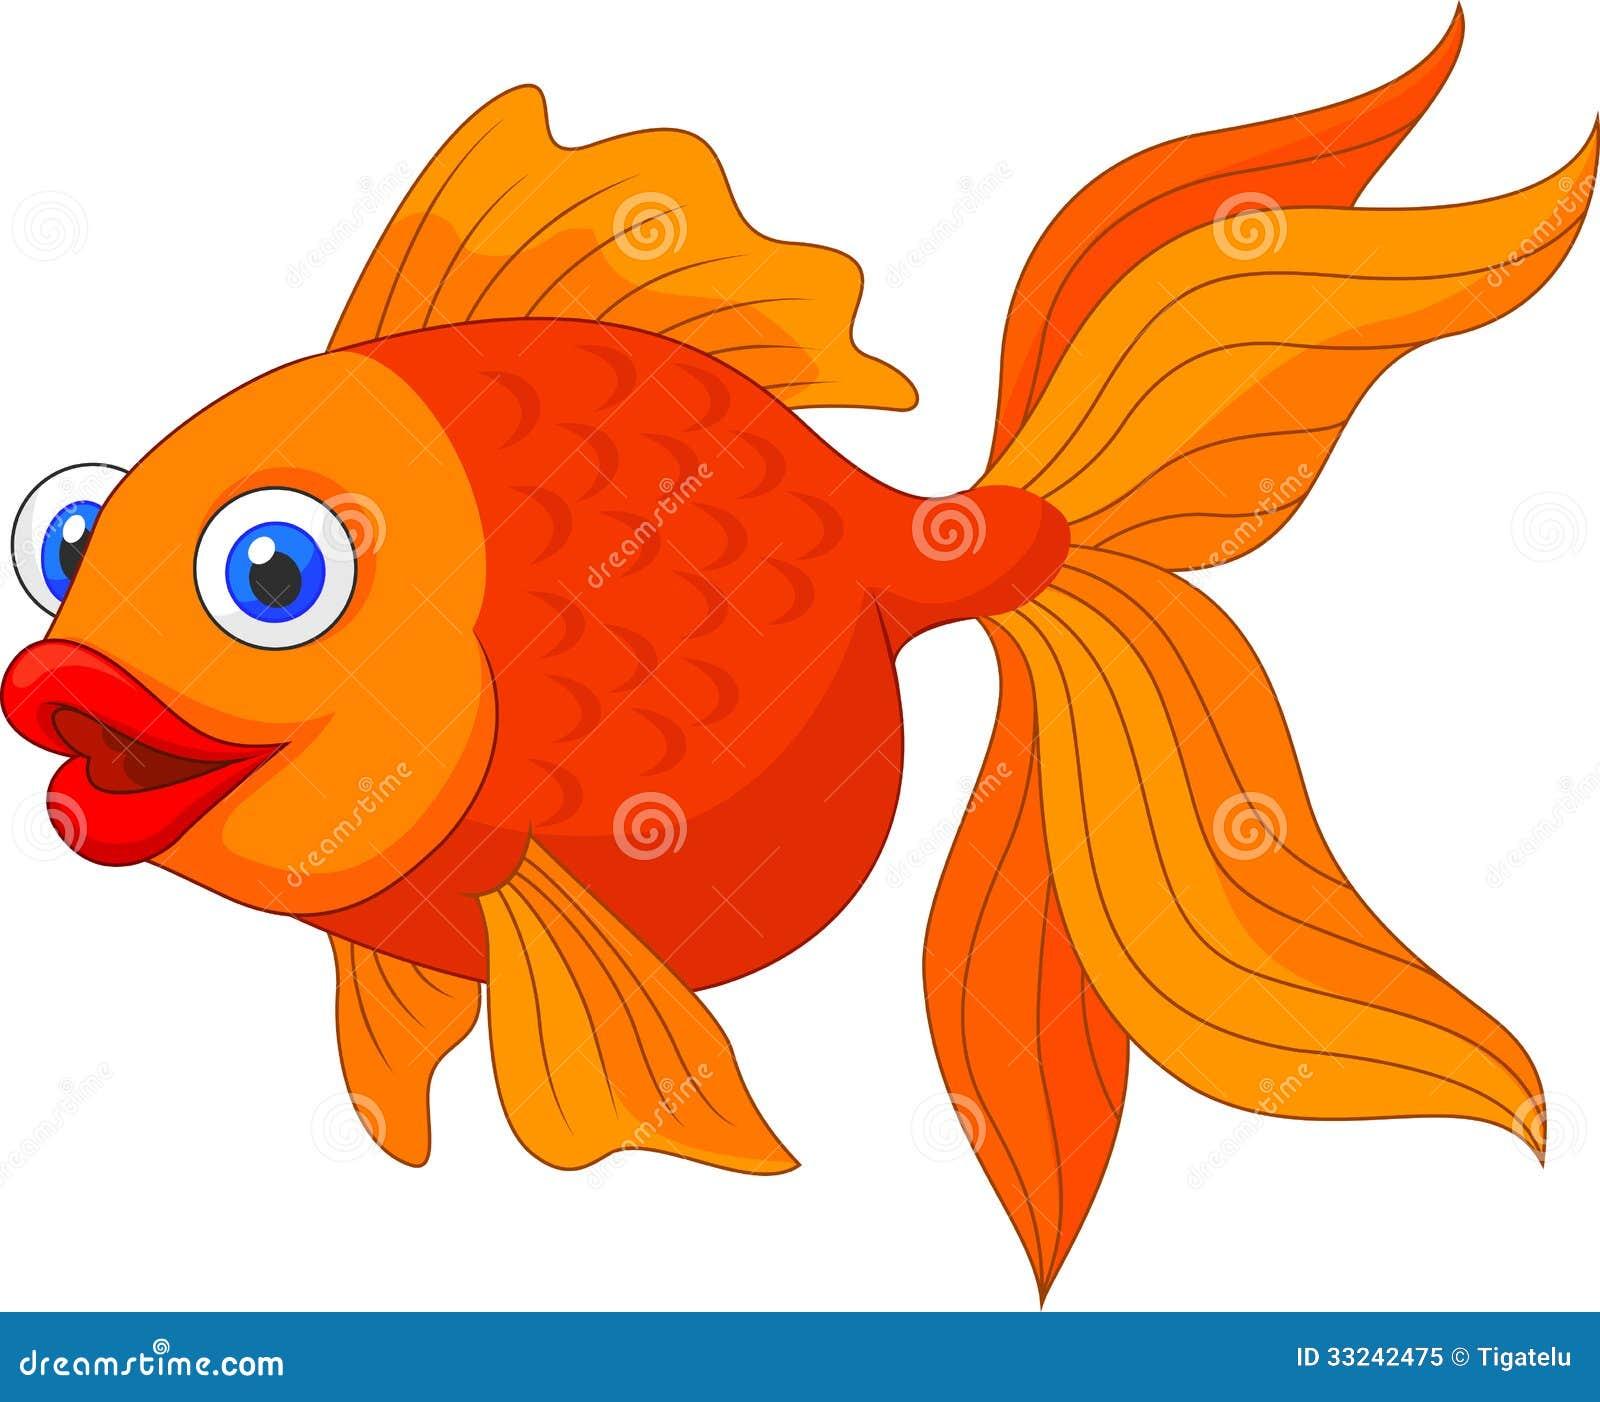 Cute Golden Fish Cartoon Royalty Free Stock Photo - Image: 33242475